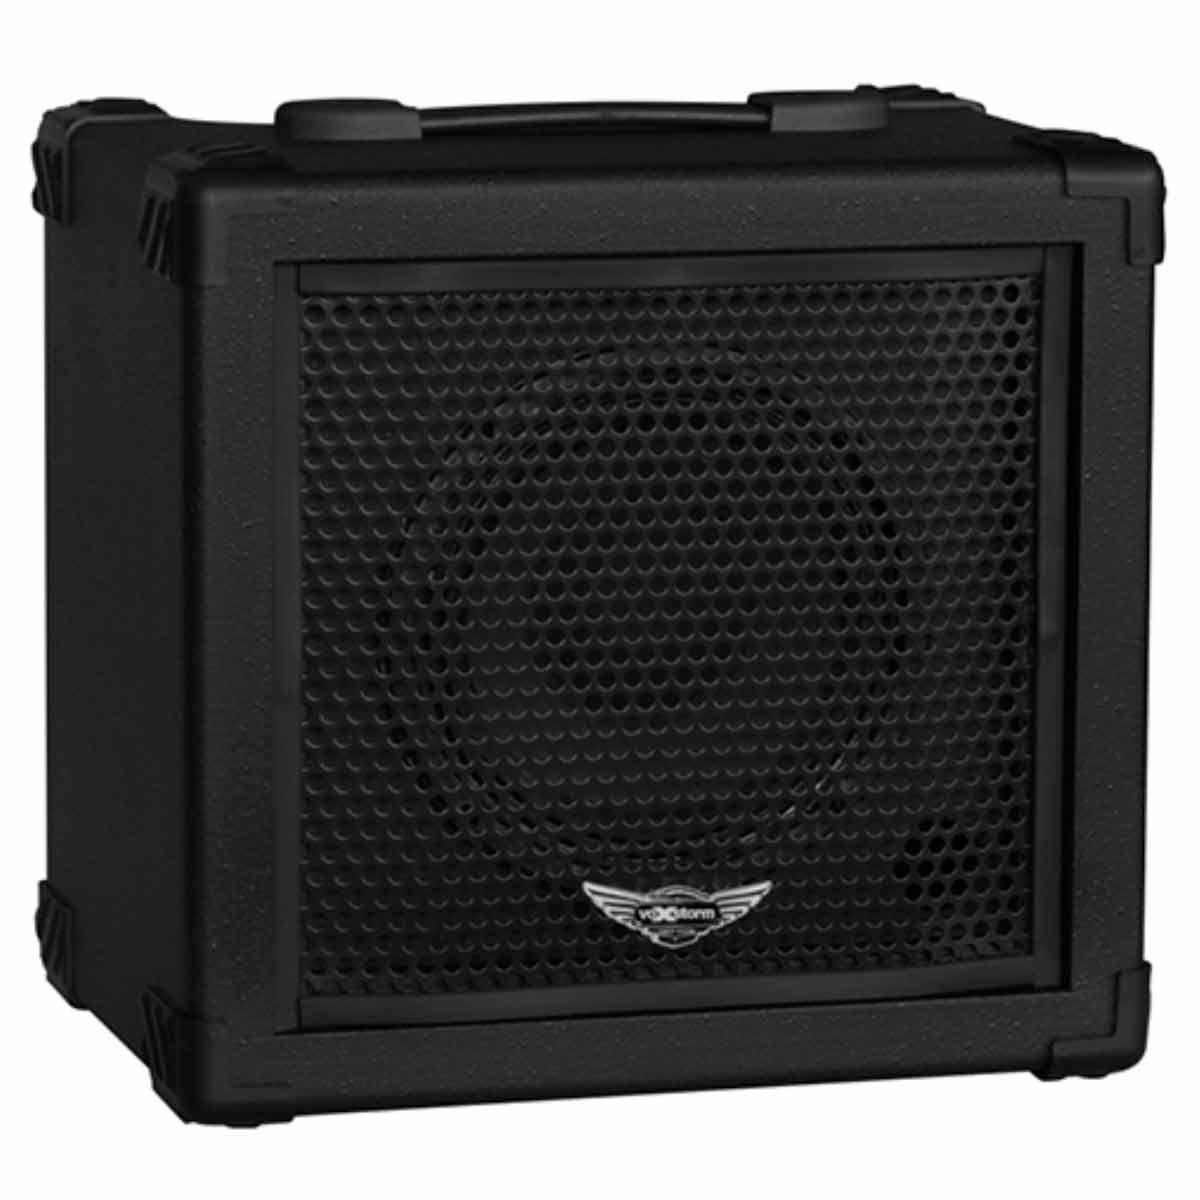 CB50 - Amplificador Combo p/ Contrabaixo 20W Top Bass CB 50 - Voxstorm